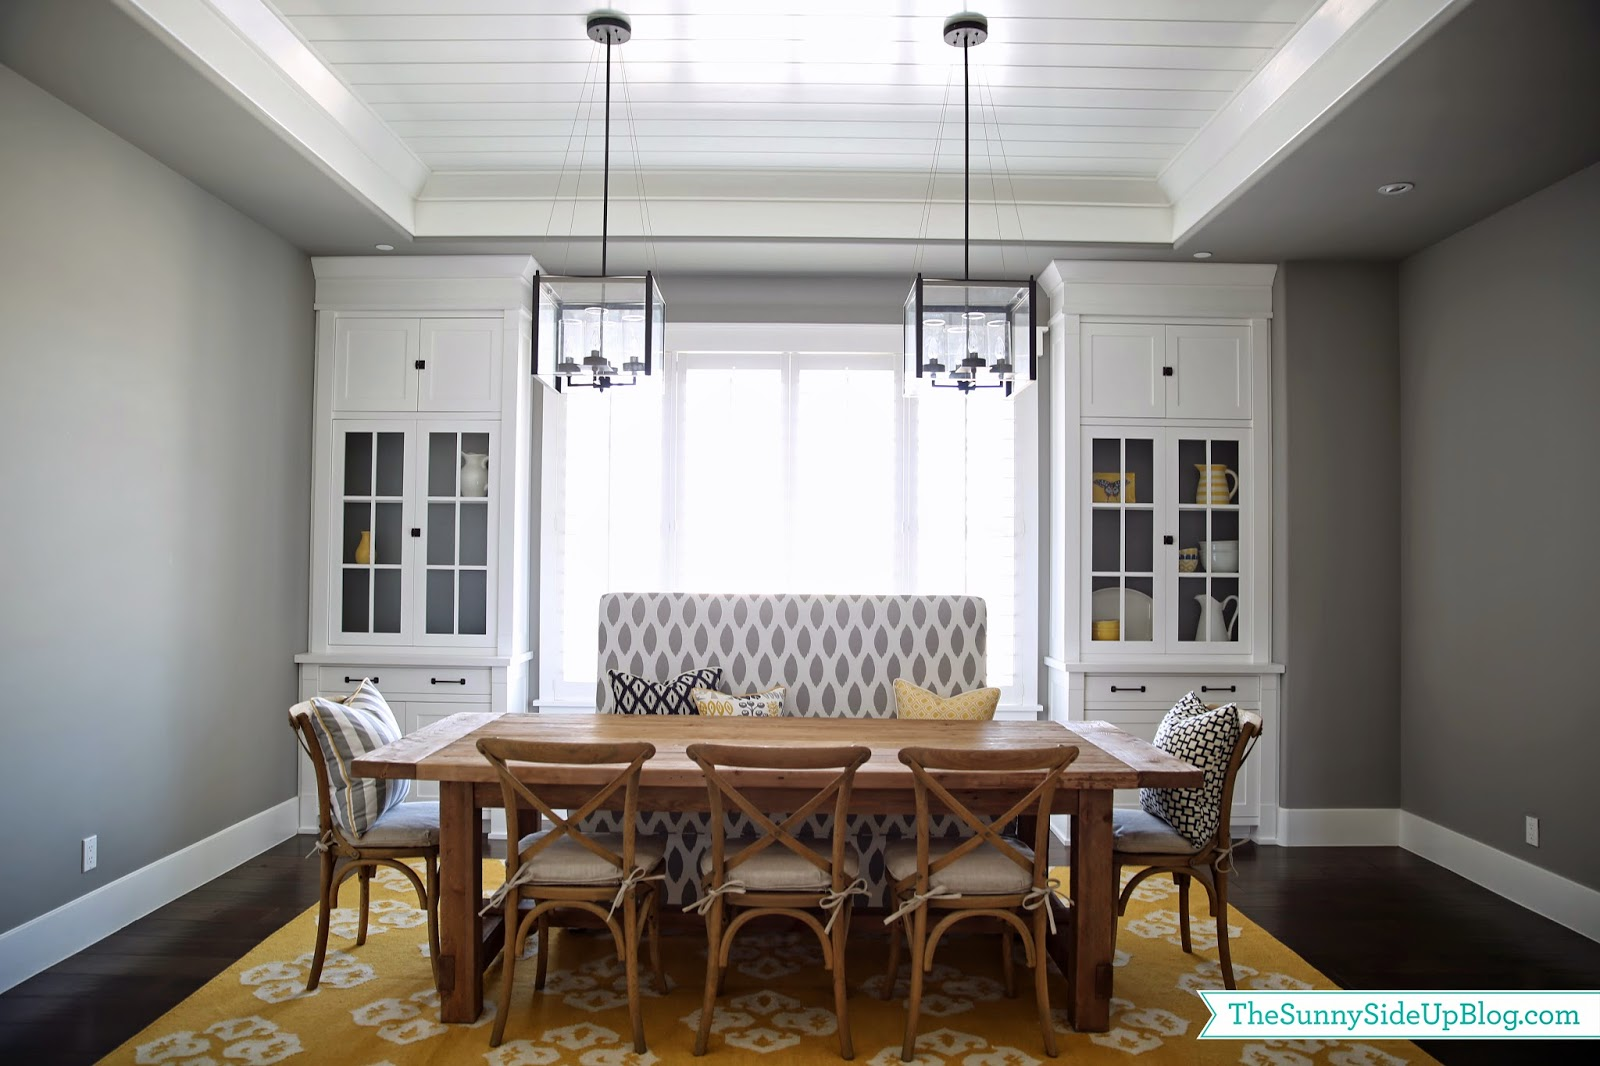 https://www.thesunnysideupblog.com/wp-content/uploads/2014/05/dining-room-with-custom-bench.jpg